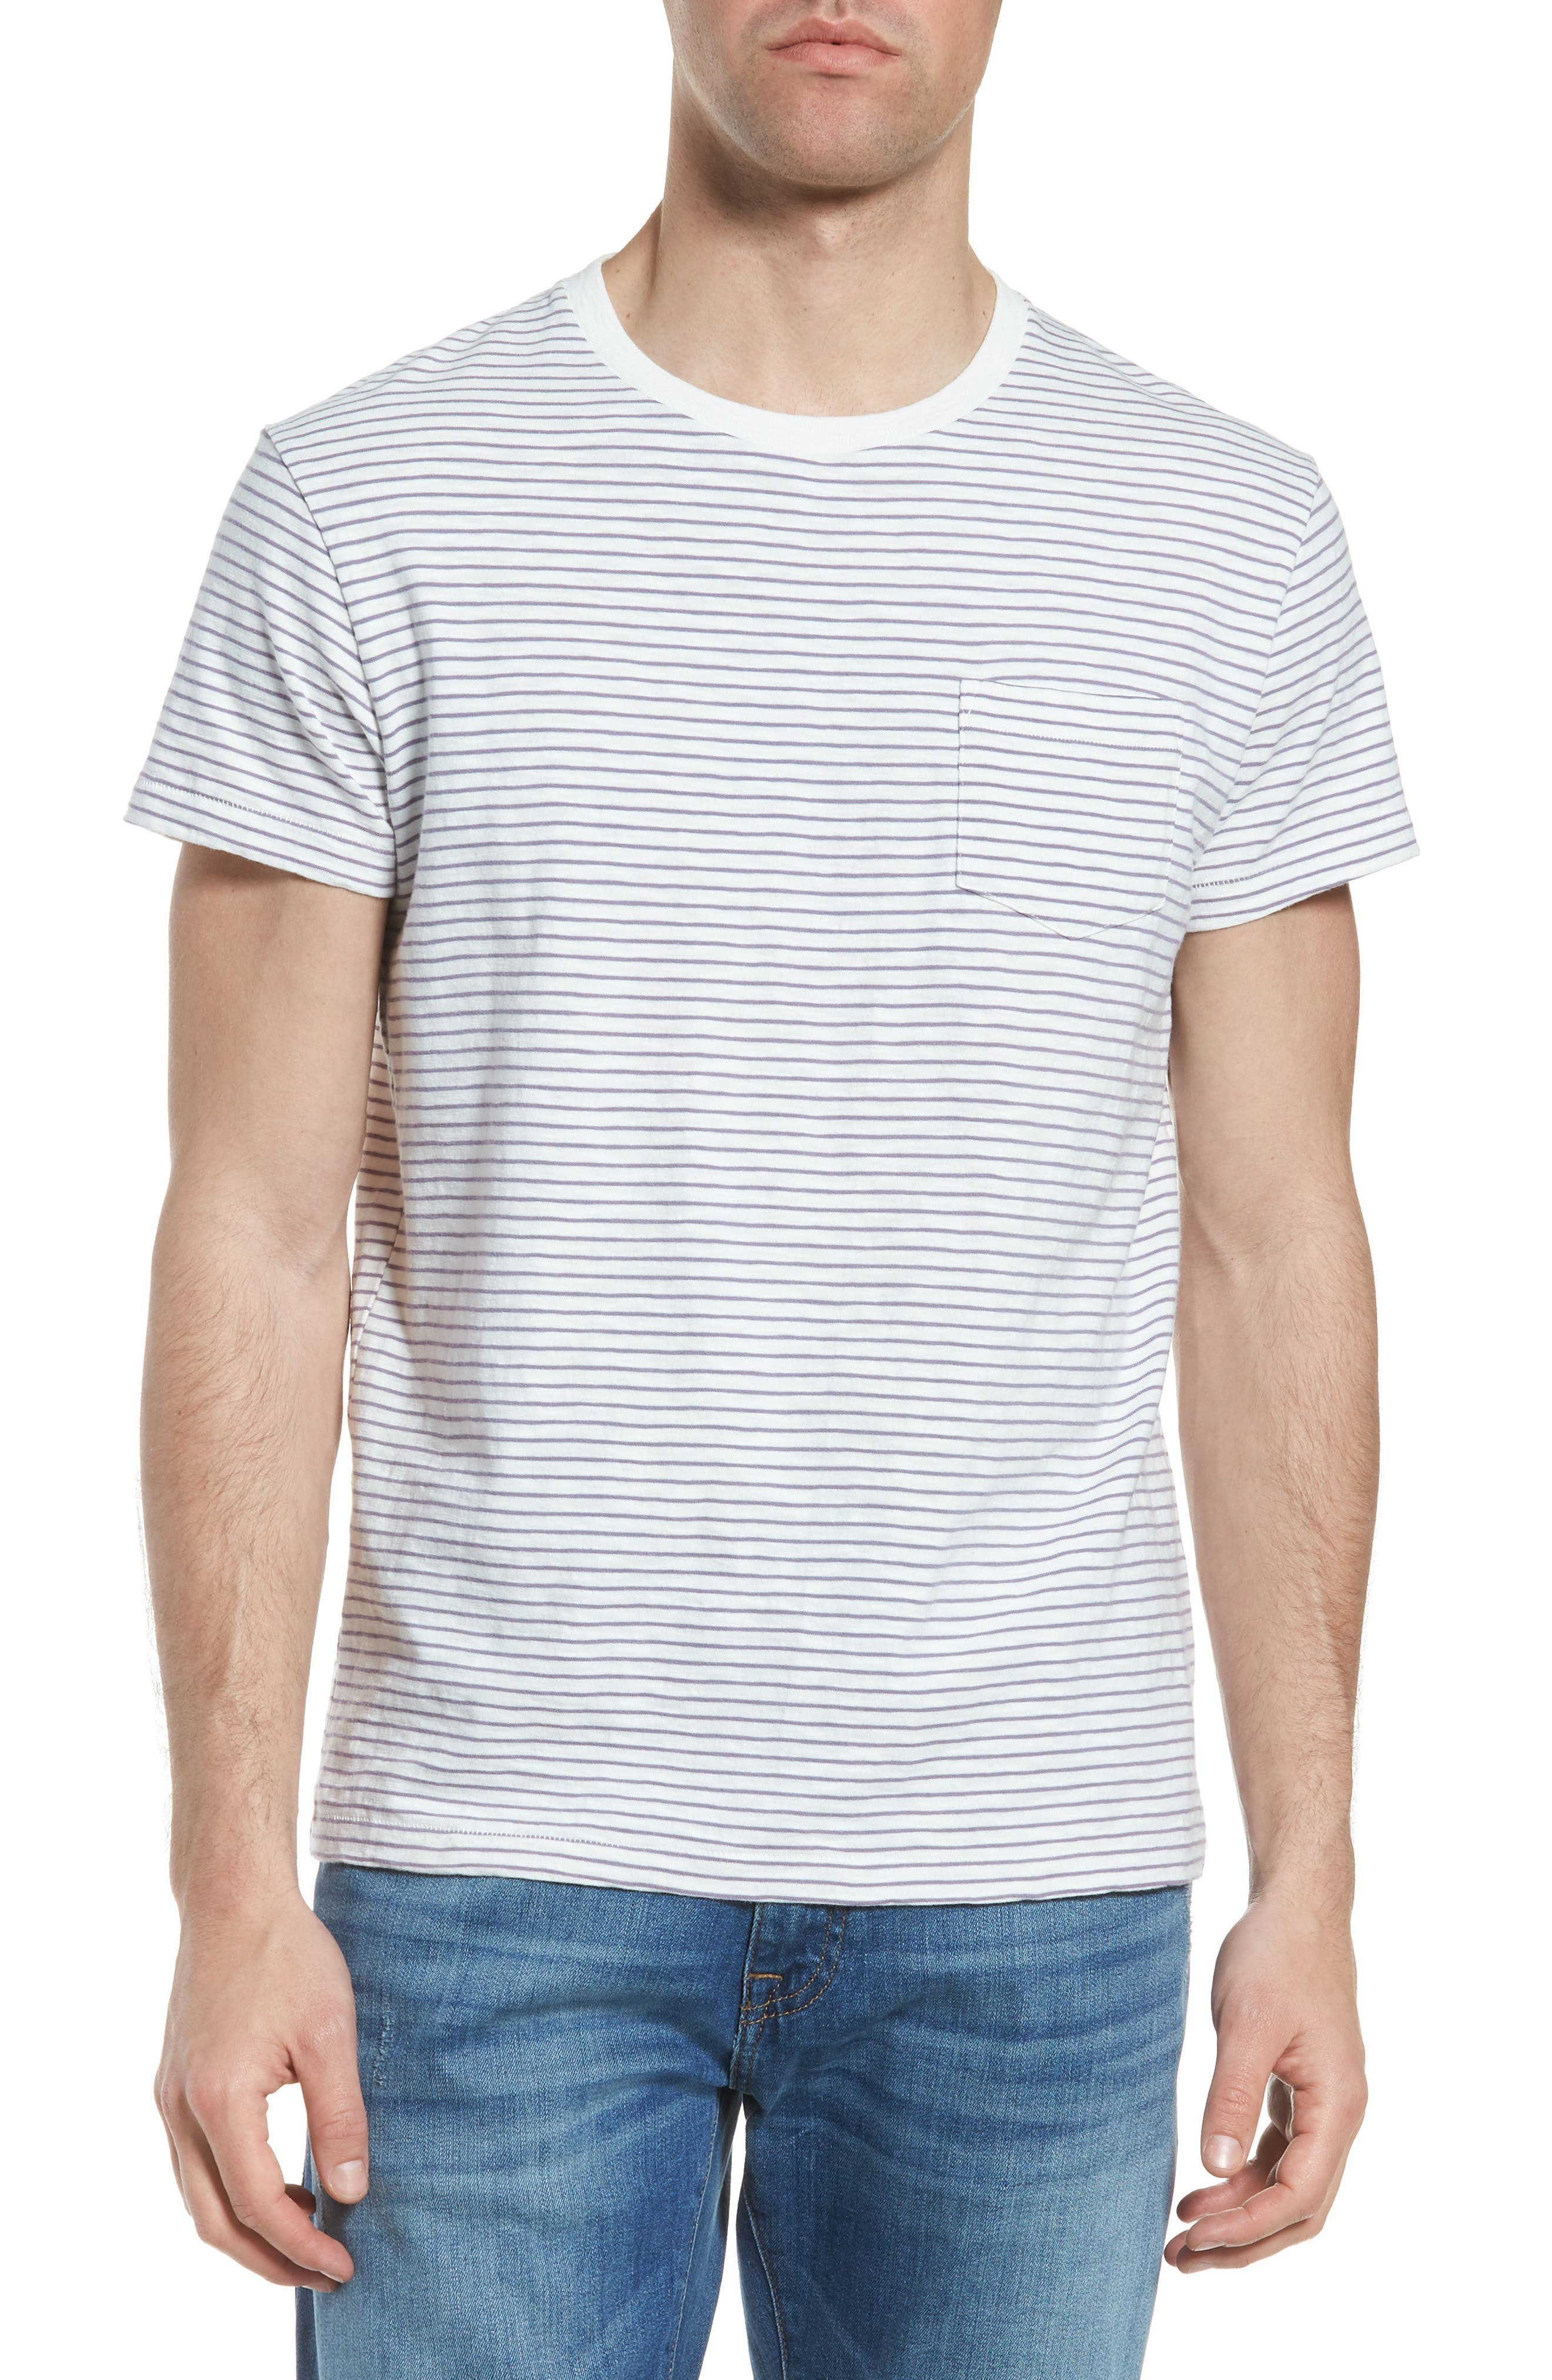 Malaga Cove Stripe T-Shirt,                             Main thumbnail 1, color,                             114